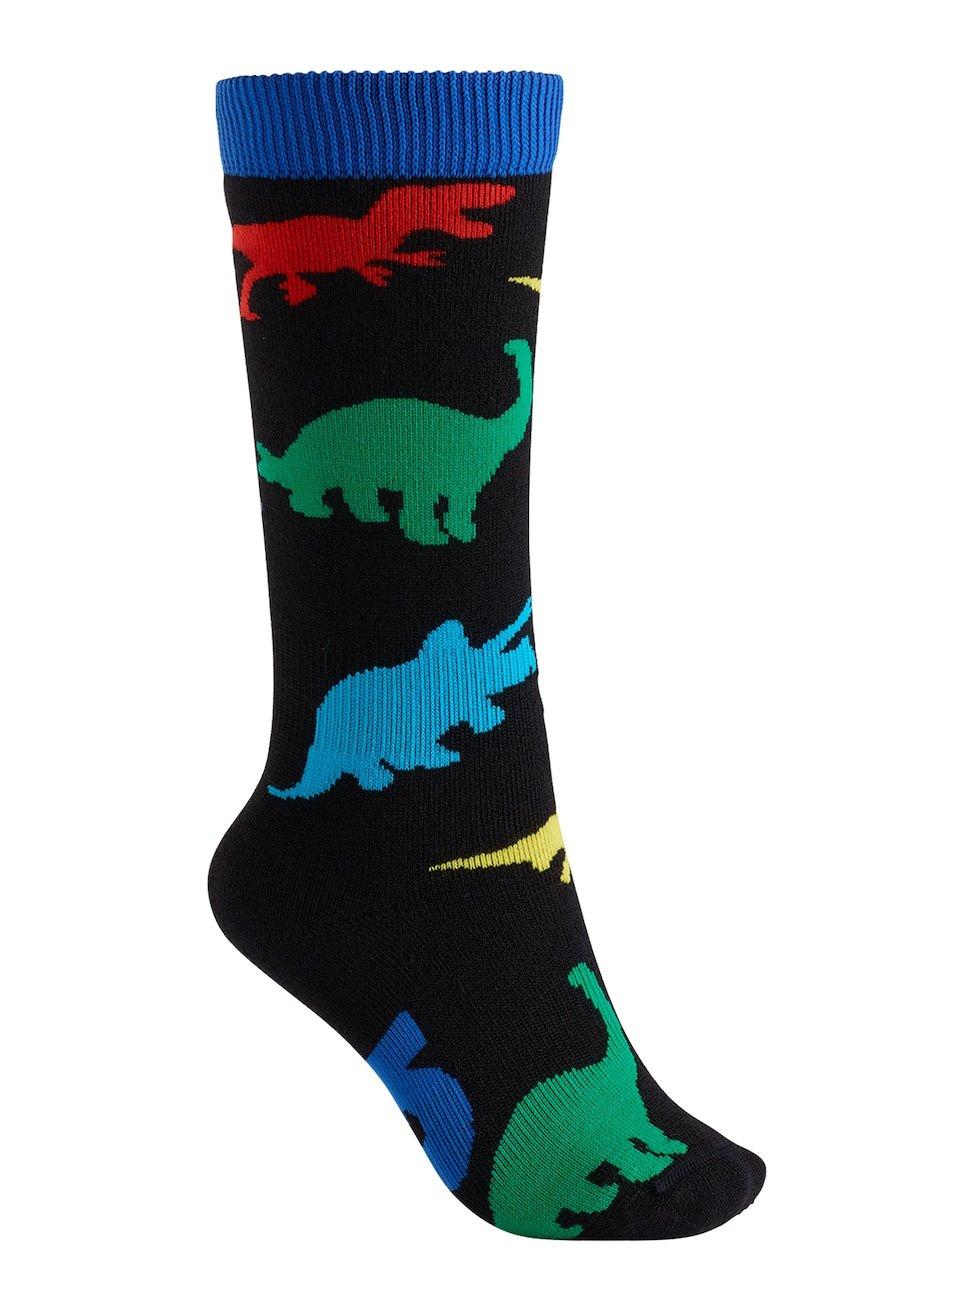 Burton Youth Mini Shred Sock Size XS/S US 10-12 by Burton